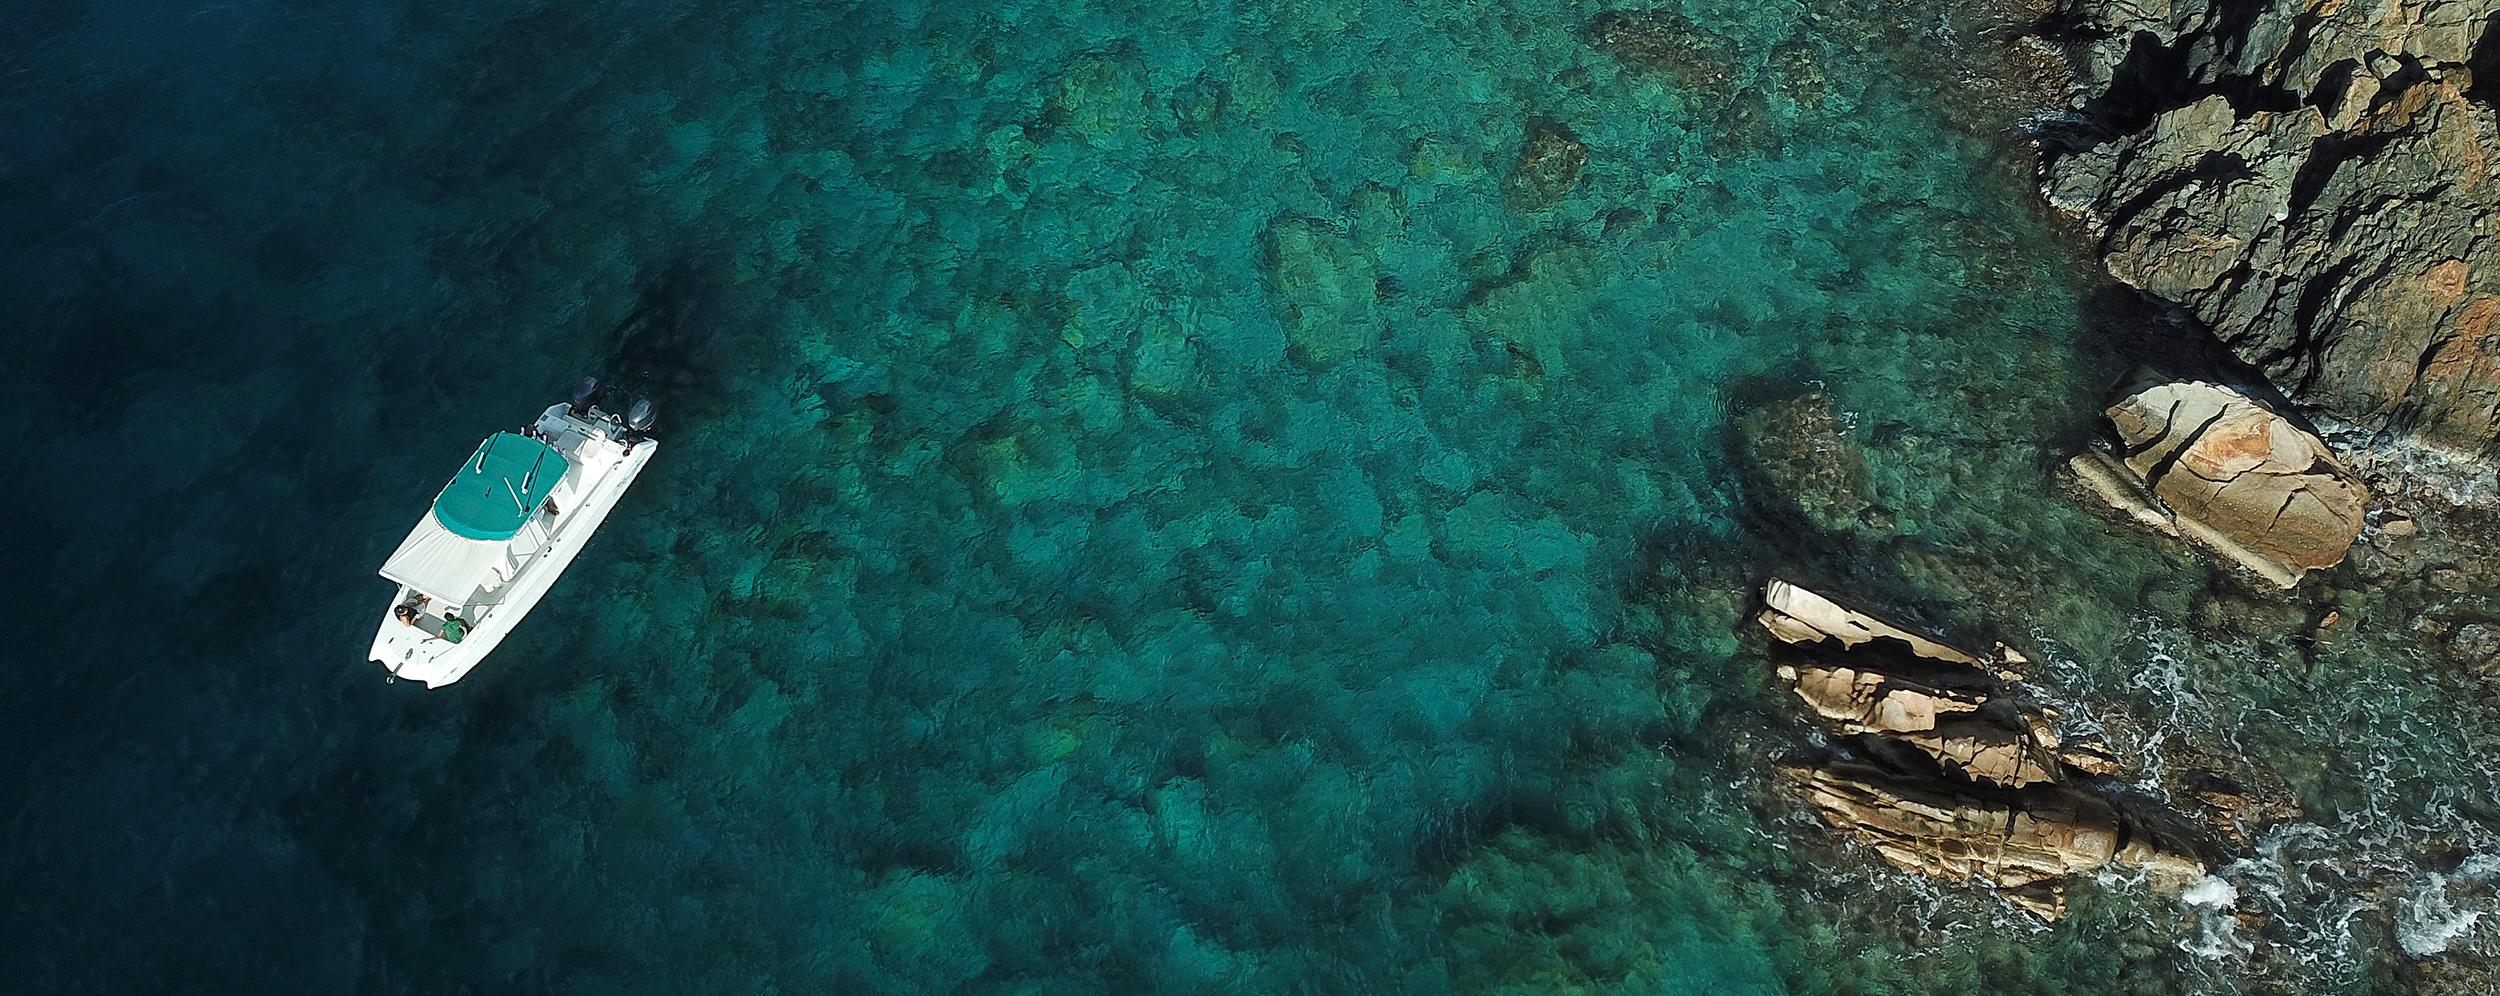 Virgin Island Adventures022.jpg - USVI Boat Charters - Caribbean Honeymoon Destinations